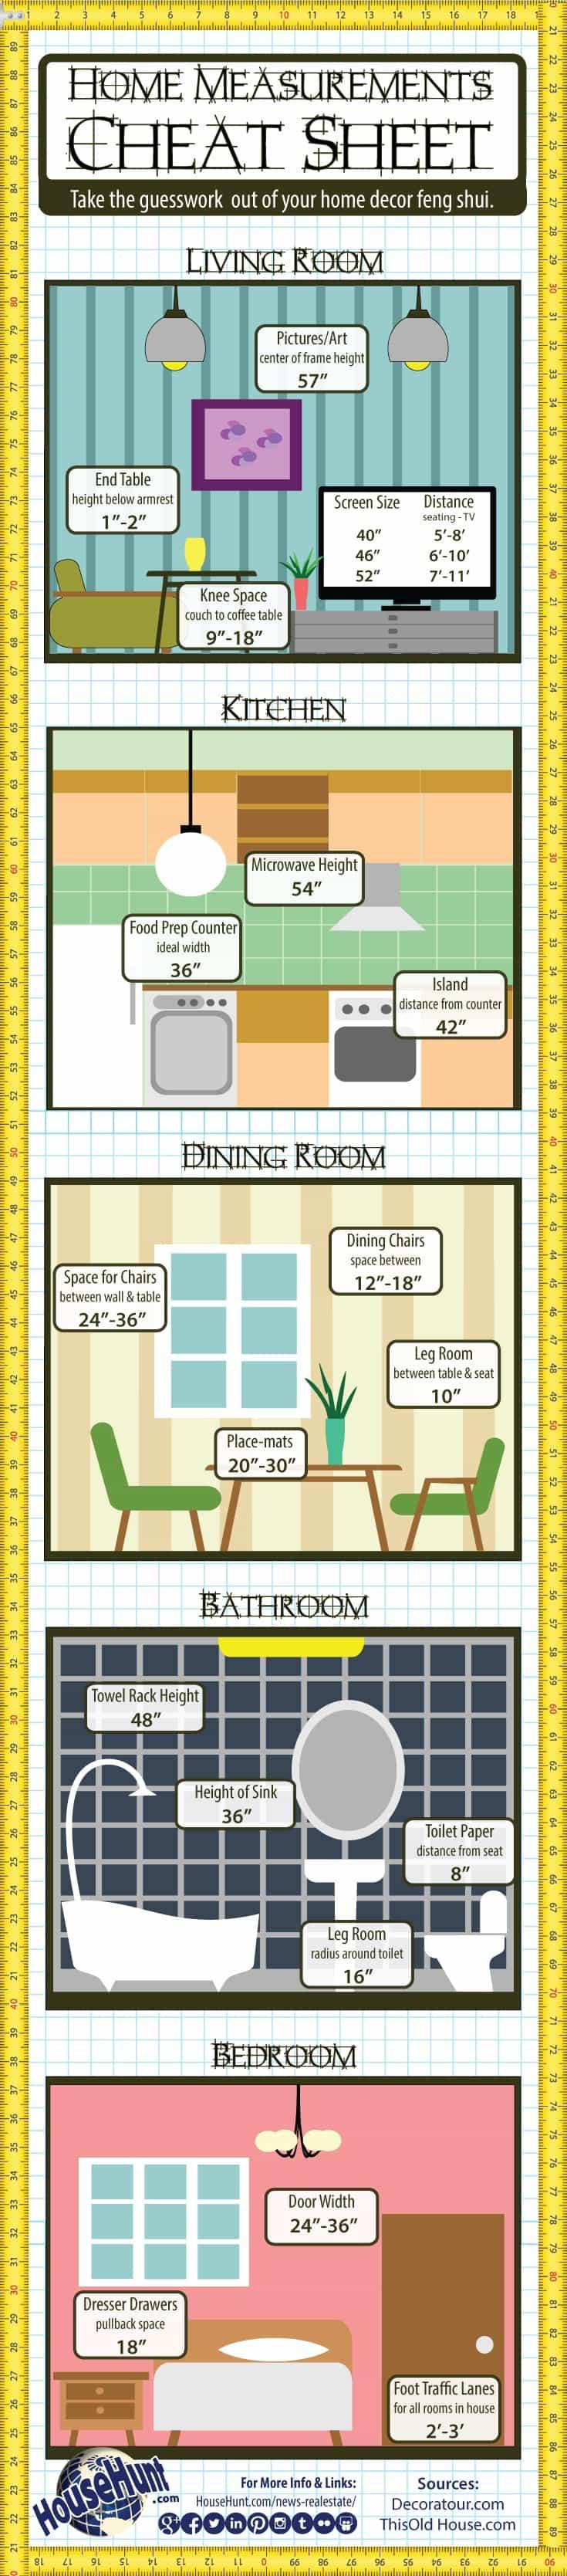 home dimensions measurements cheat sheet